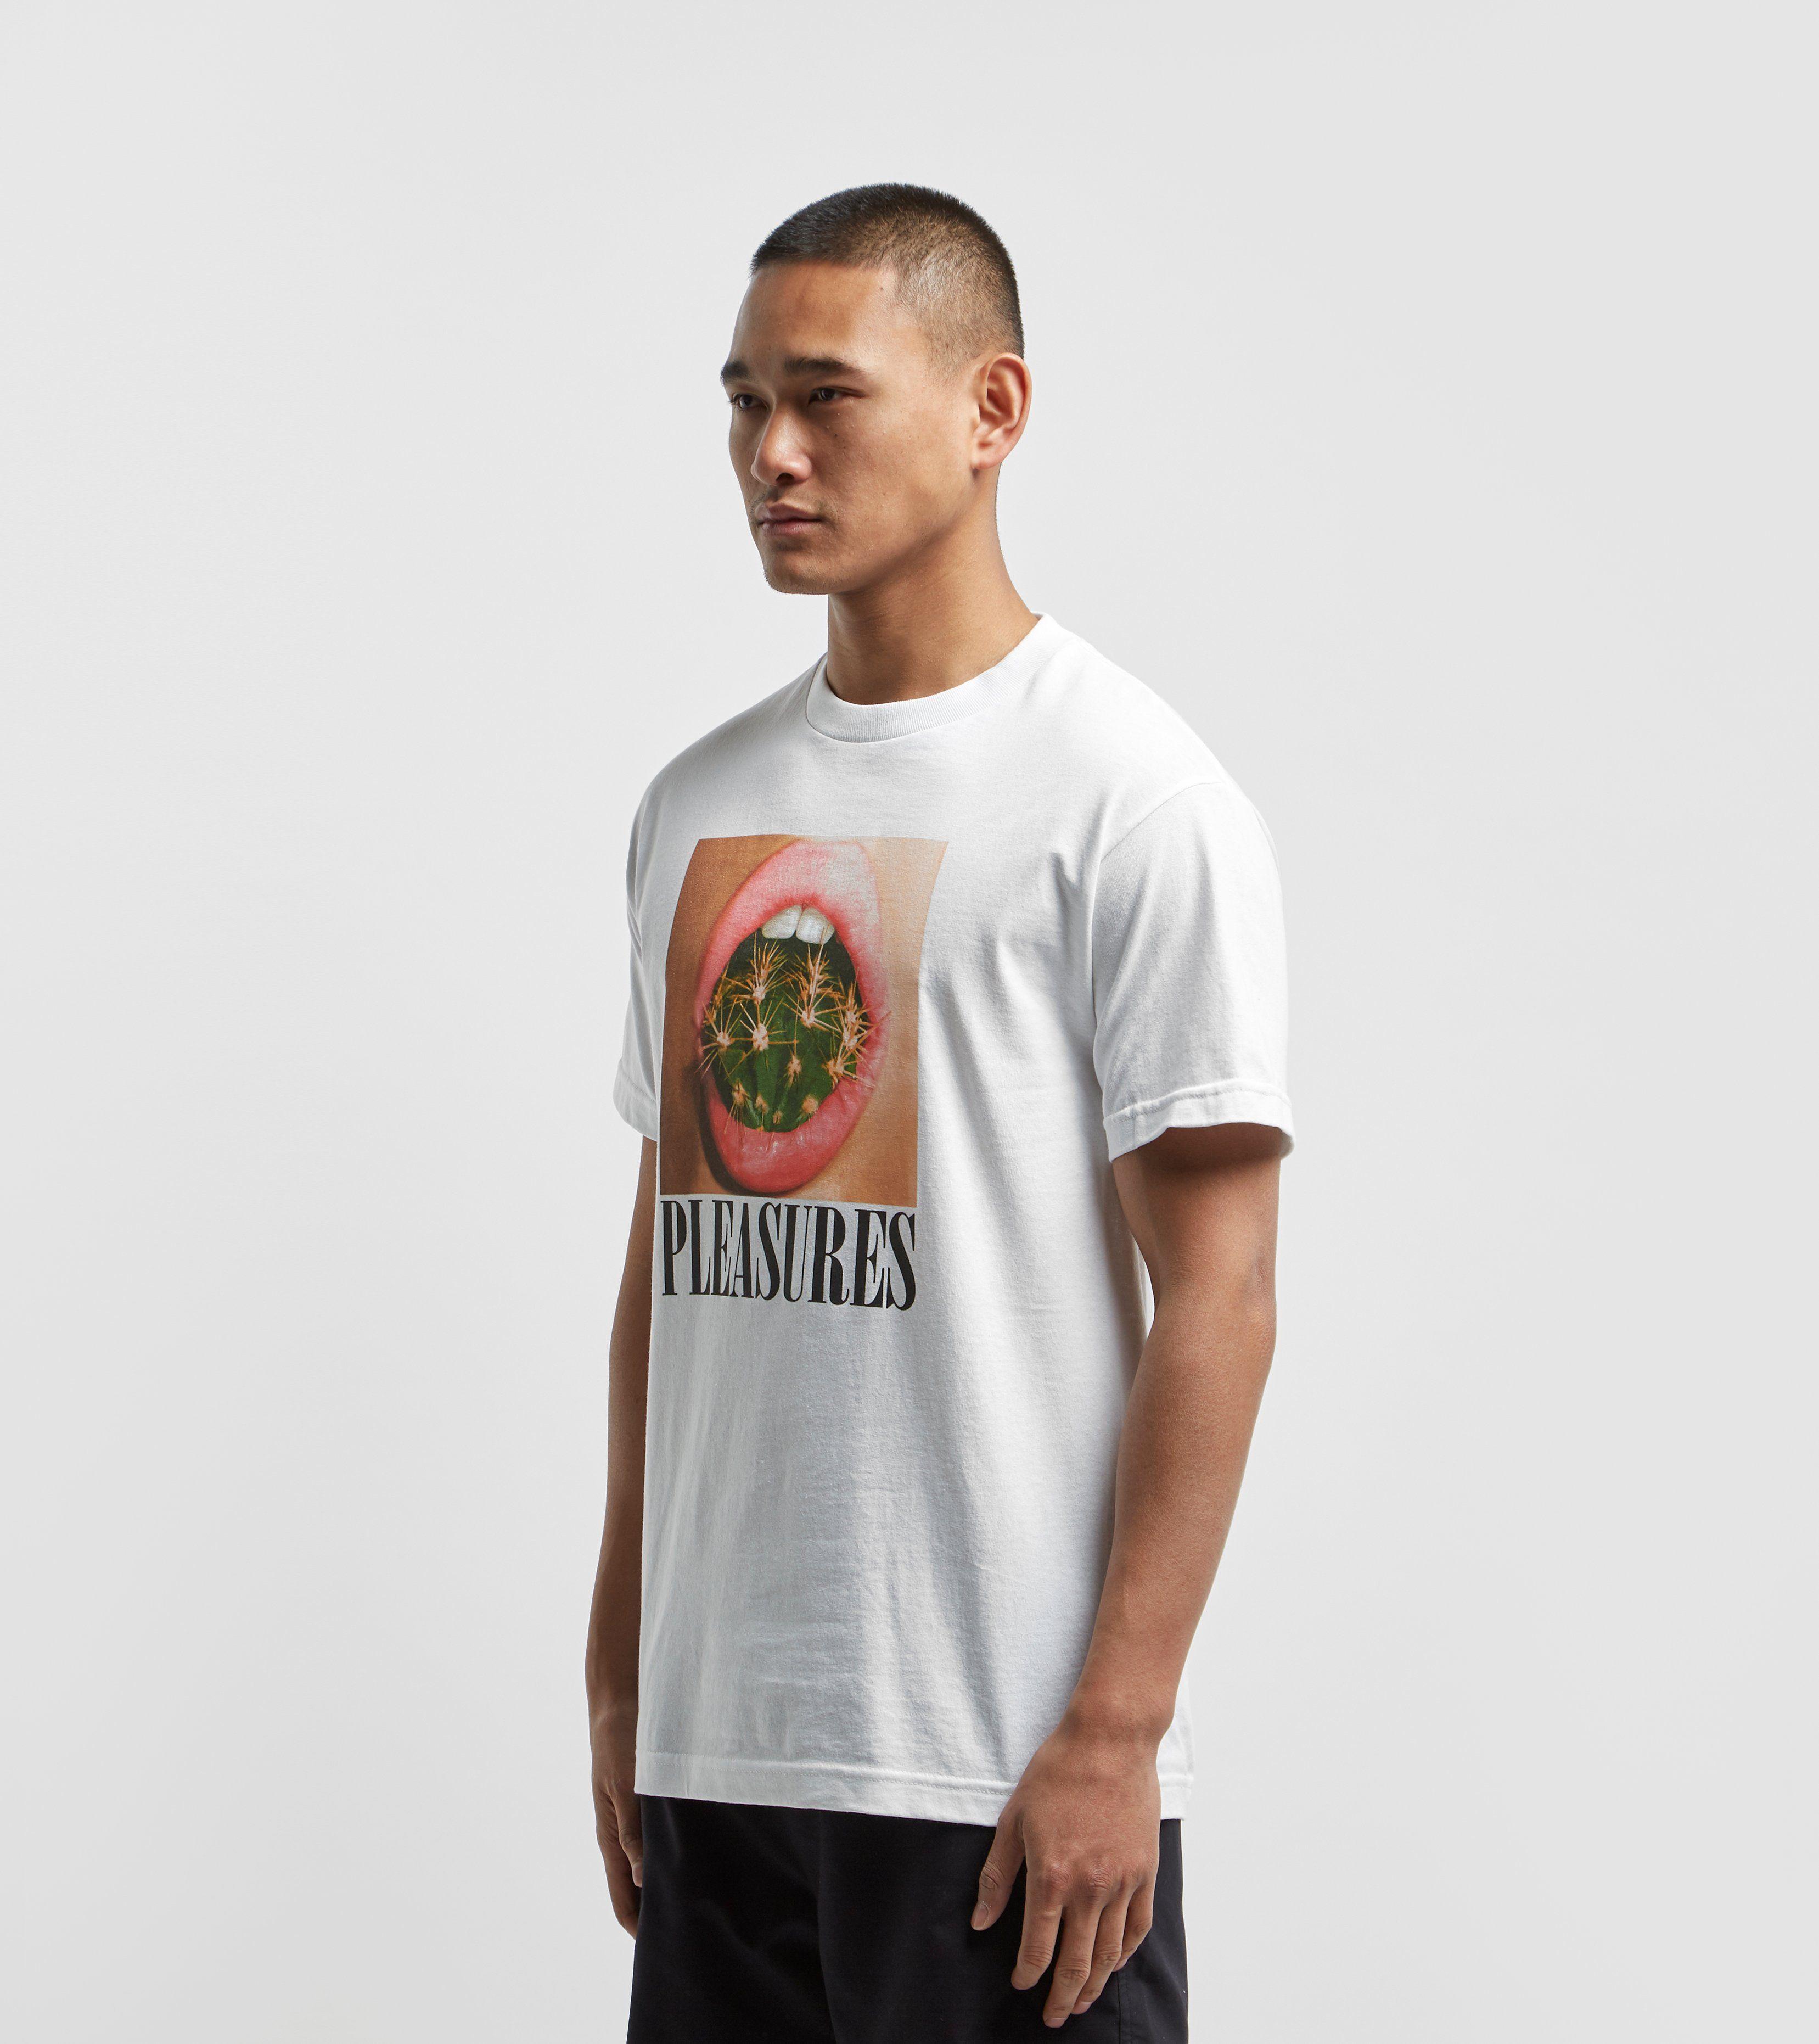 PLEASURES Prick T-Shirt